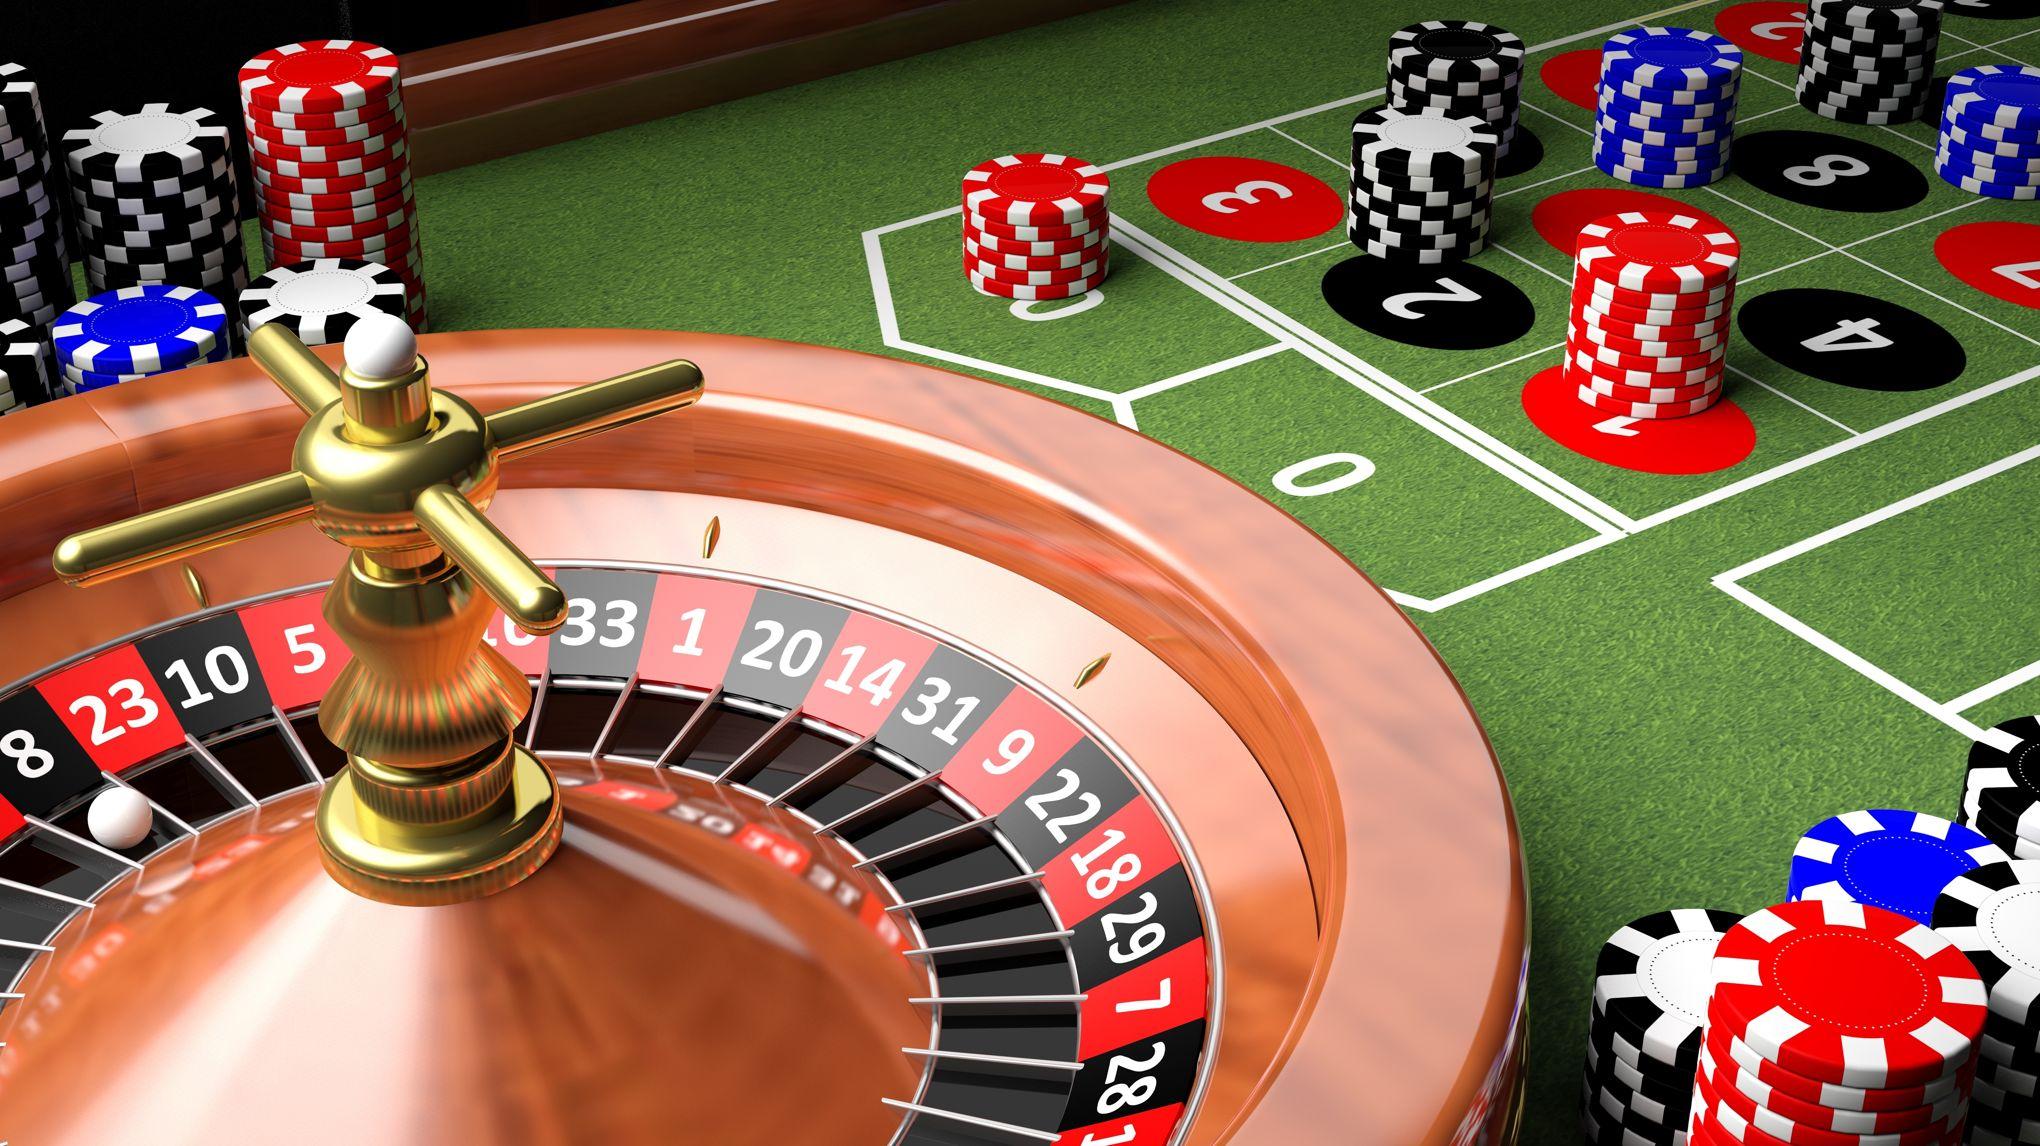 Rencontre un joueur compulsif